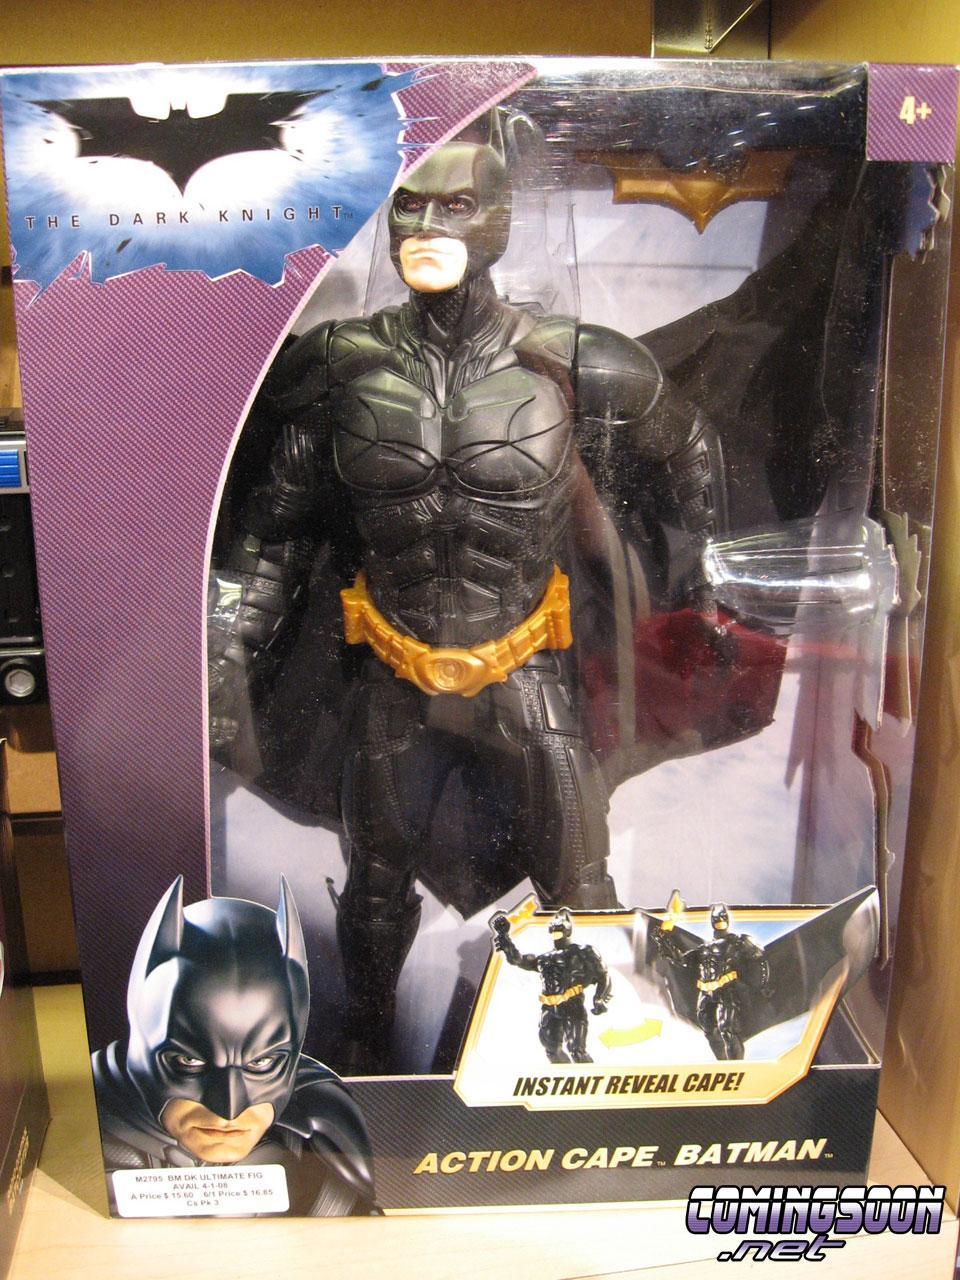 The Dark Knight Mattel S Dark Knight Toys Unveiled